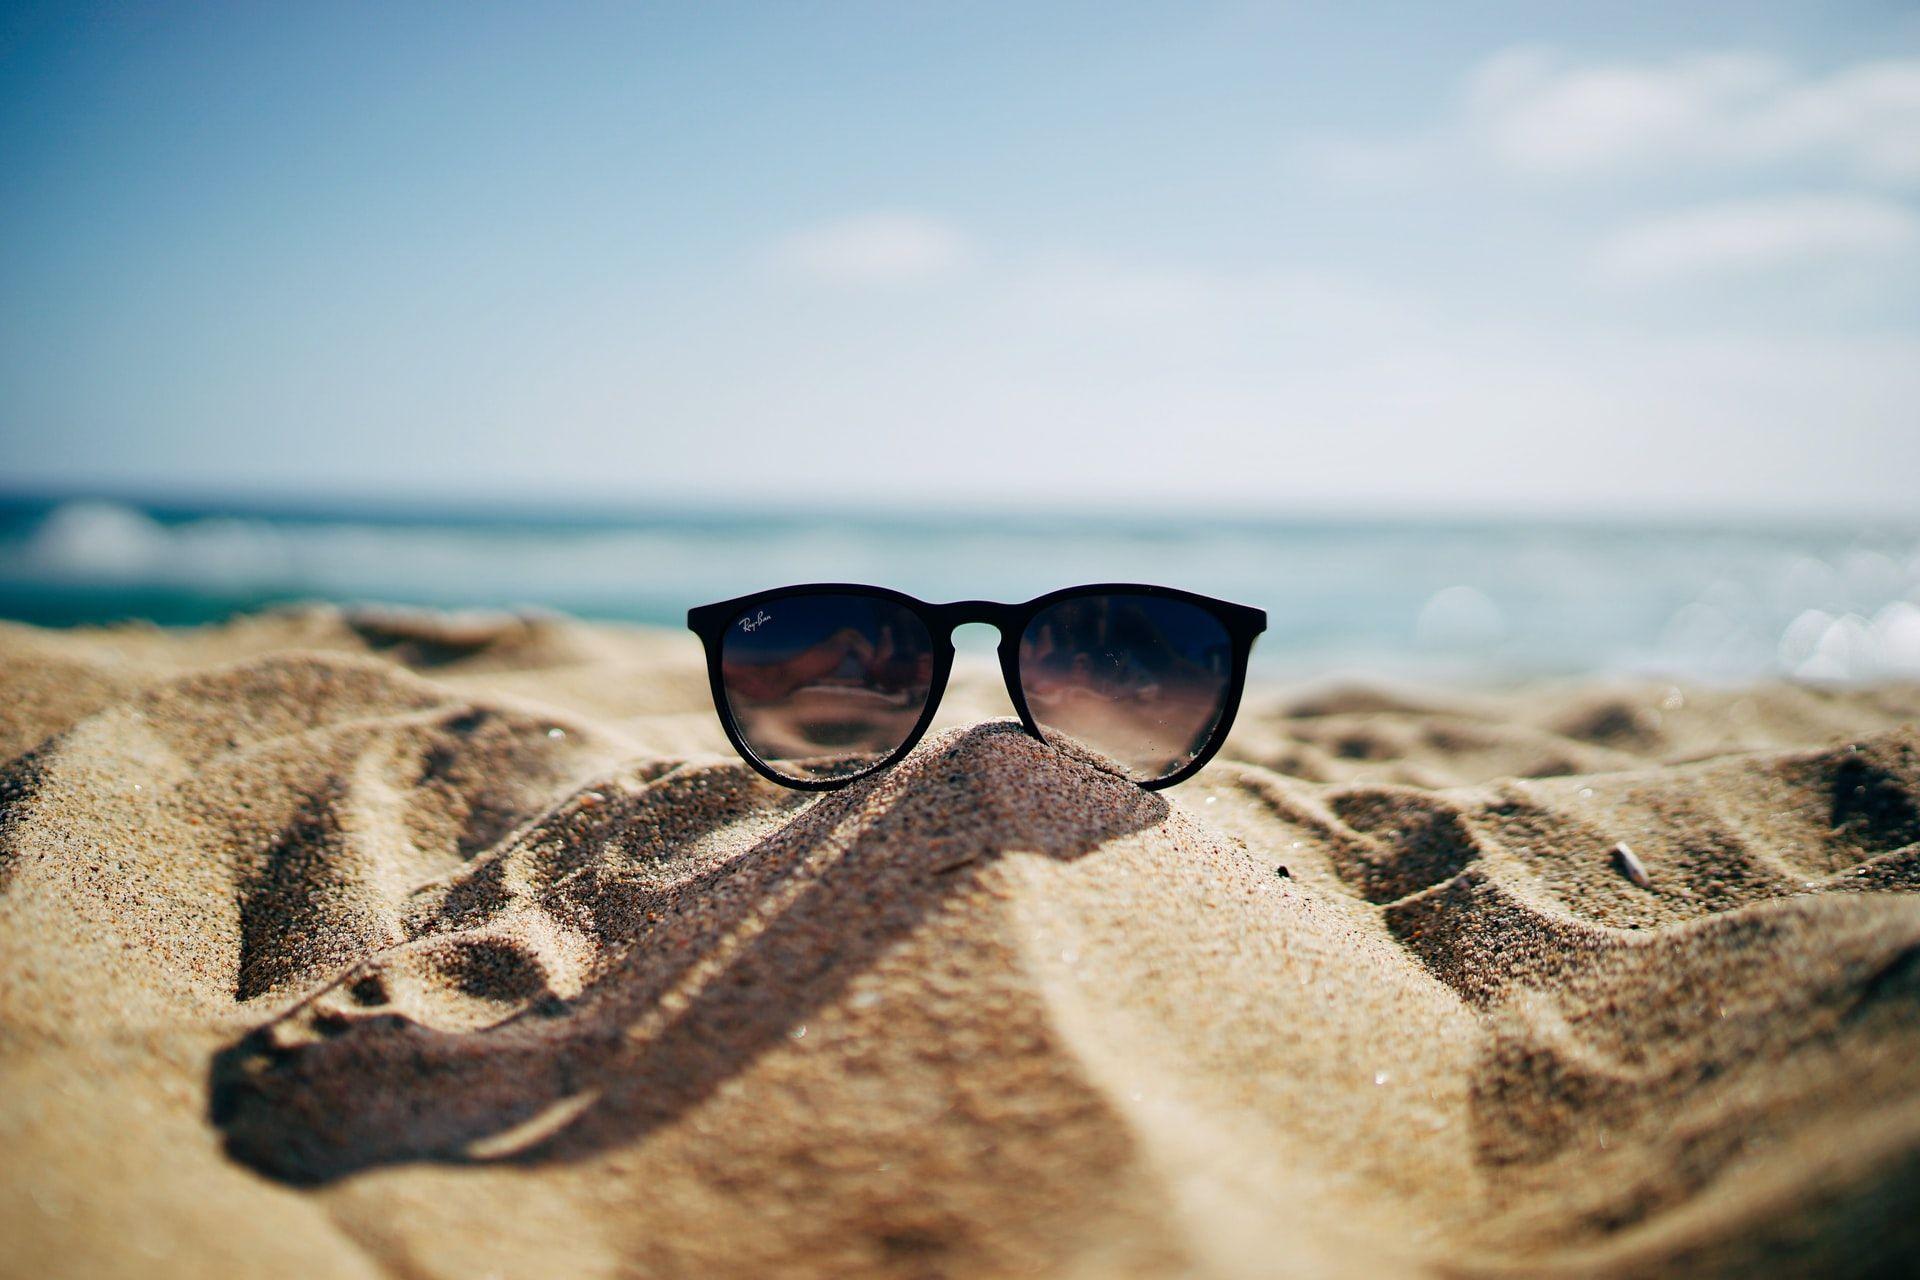 beach sunglasses hot weather poorer memory